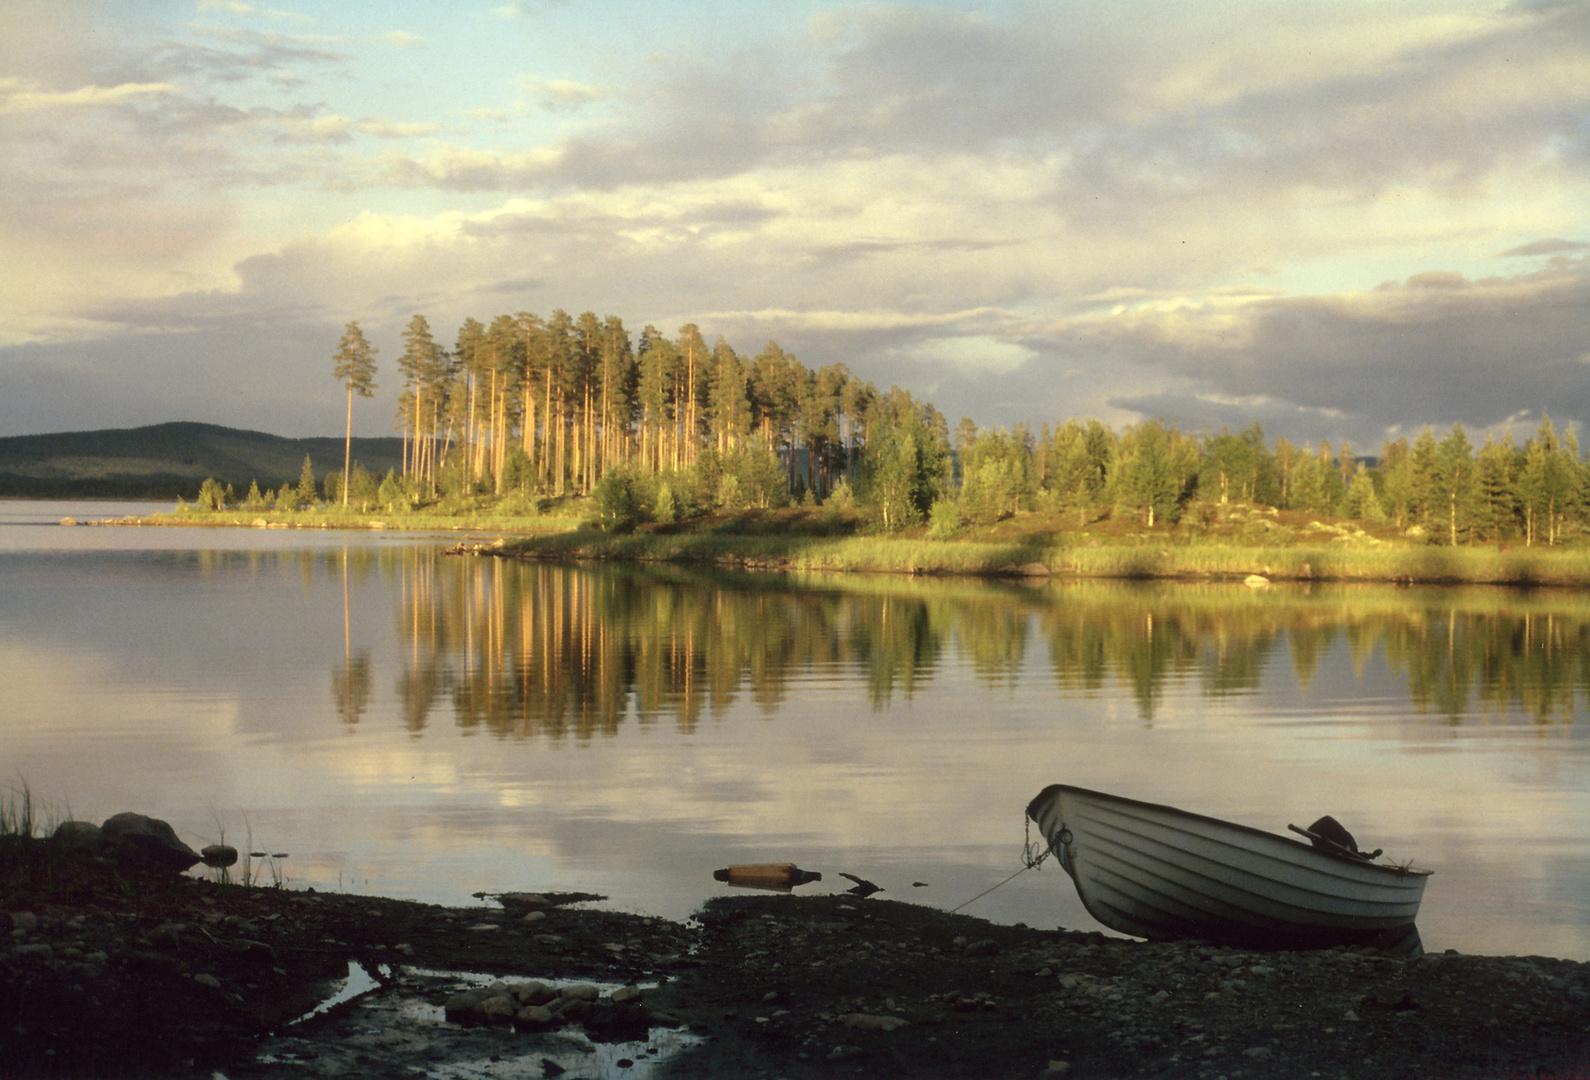 Am Tysjön, Dalarna, Schweden